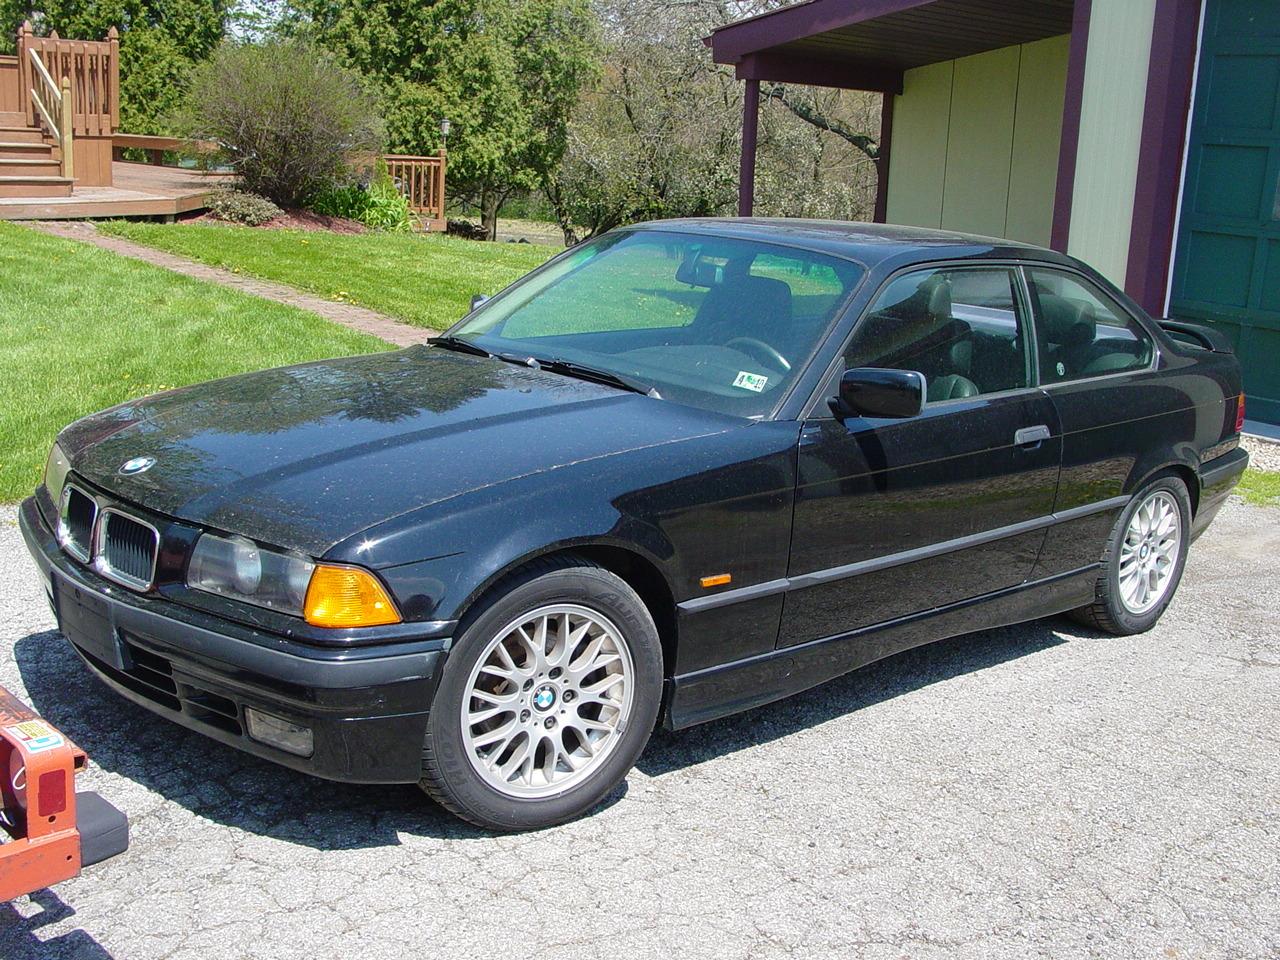 1992 BMW 3 SERIES - Image #7